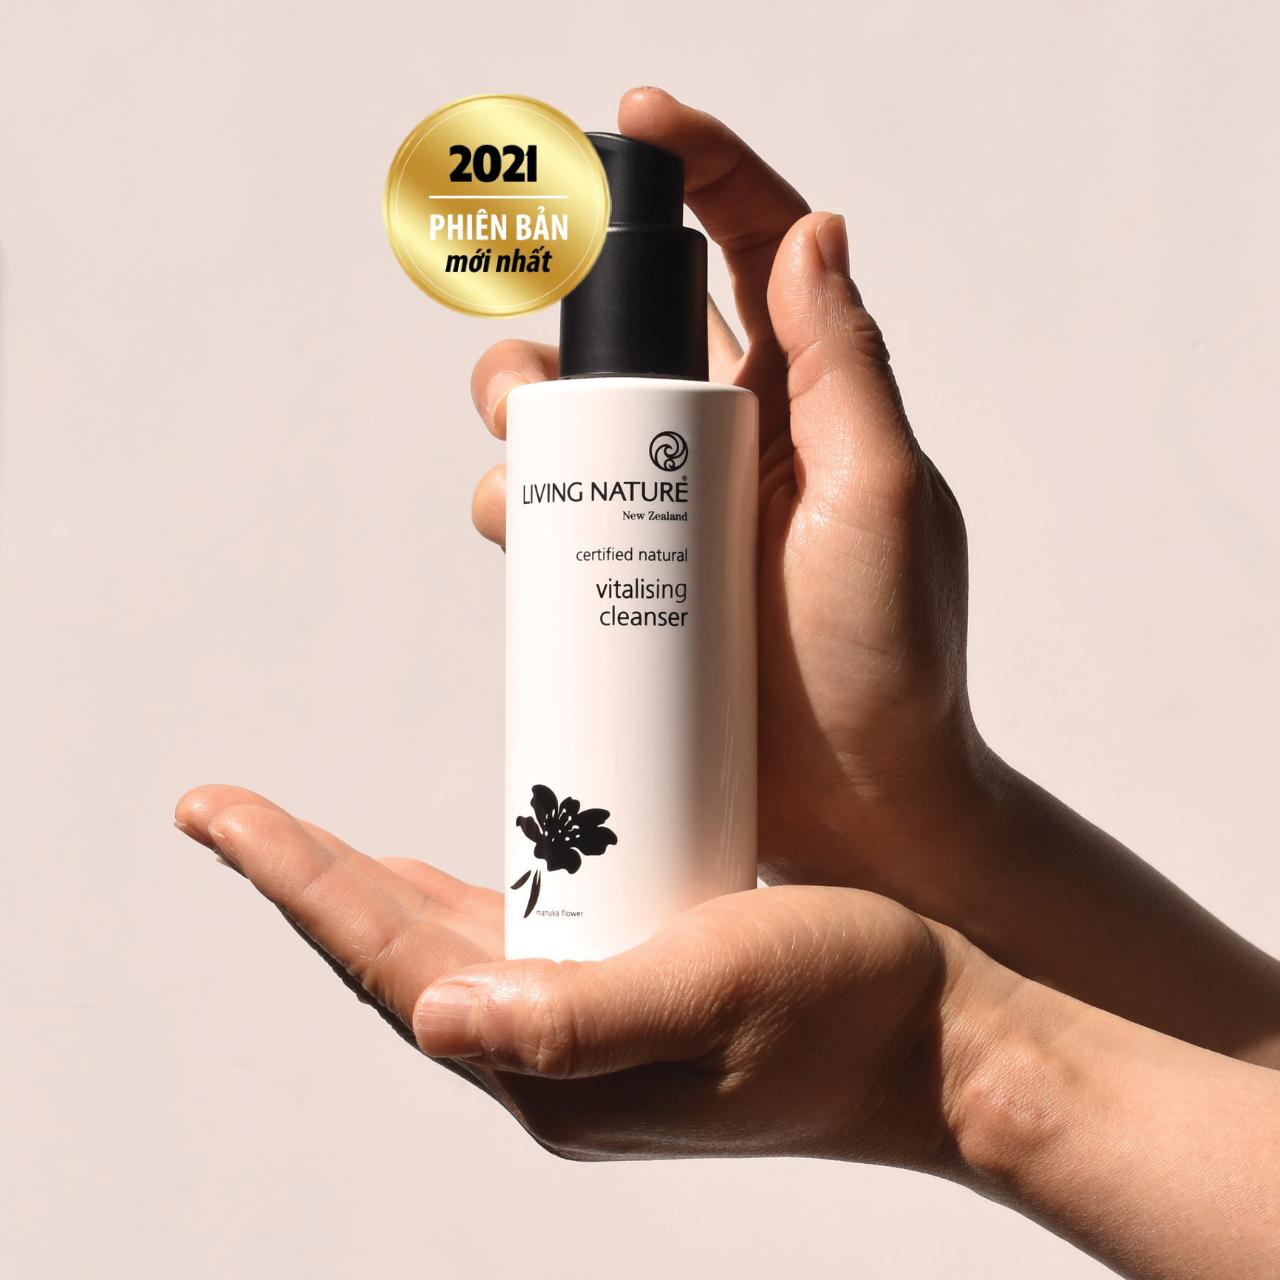 Sữa rửa mặt Living Nature Vitalising Cleanser 5